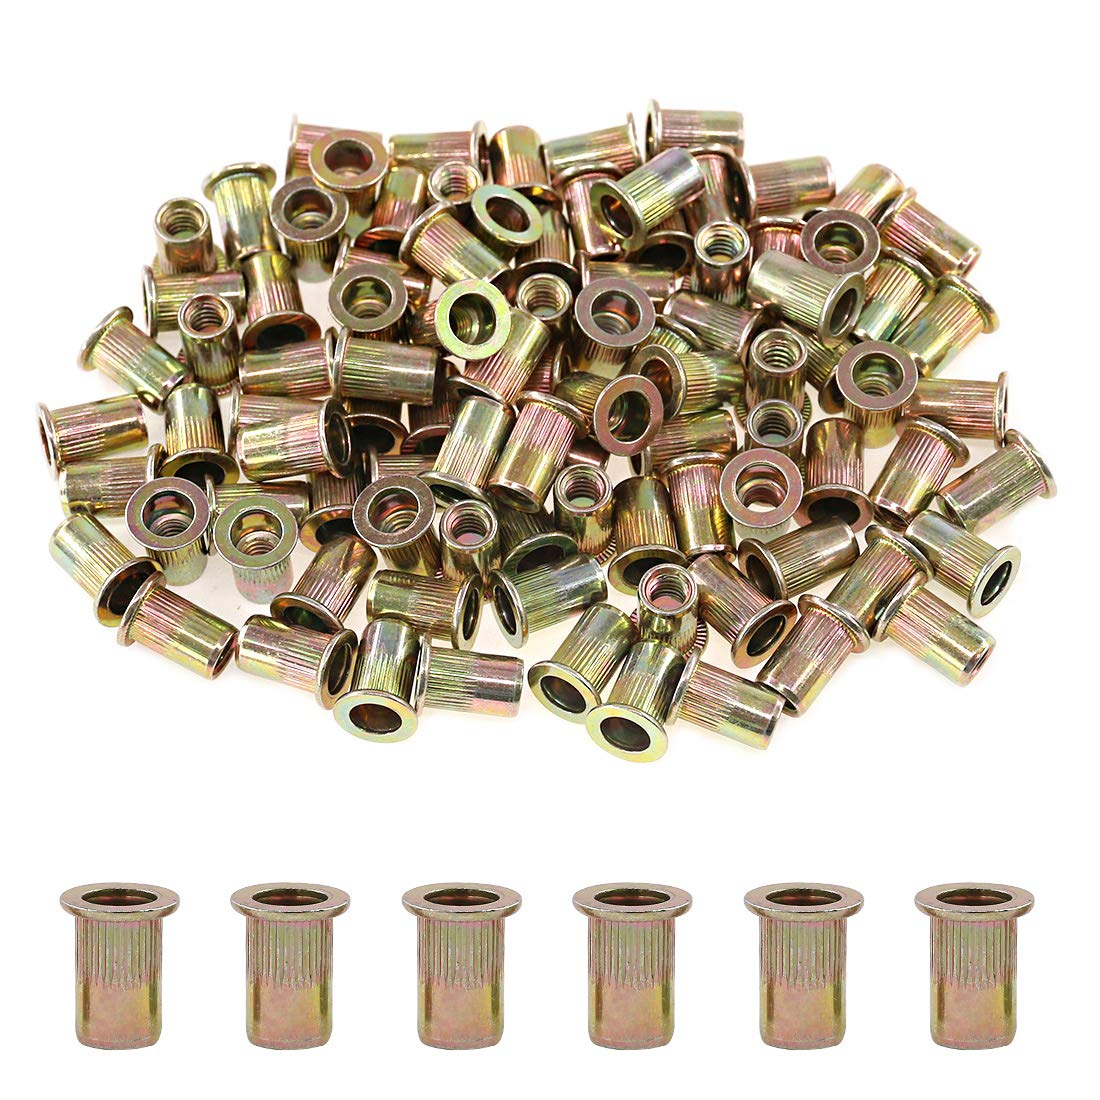 uxcell/® 40Pcs 304 Stainless Steel 1//4-20 UNC Flat Head Rivet Nut Insert Nutsert